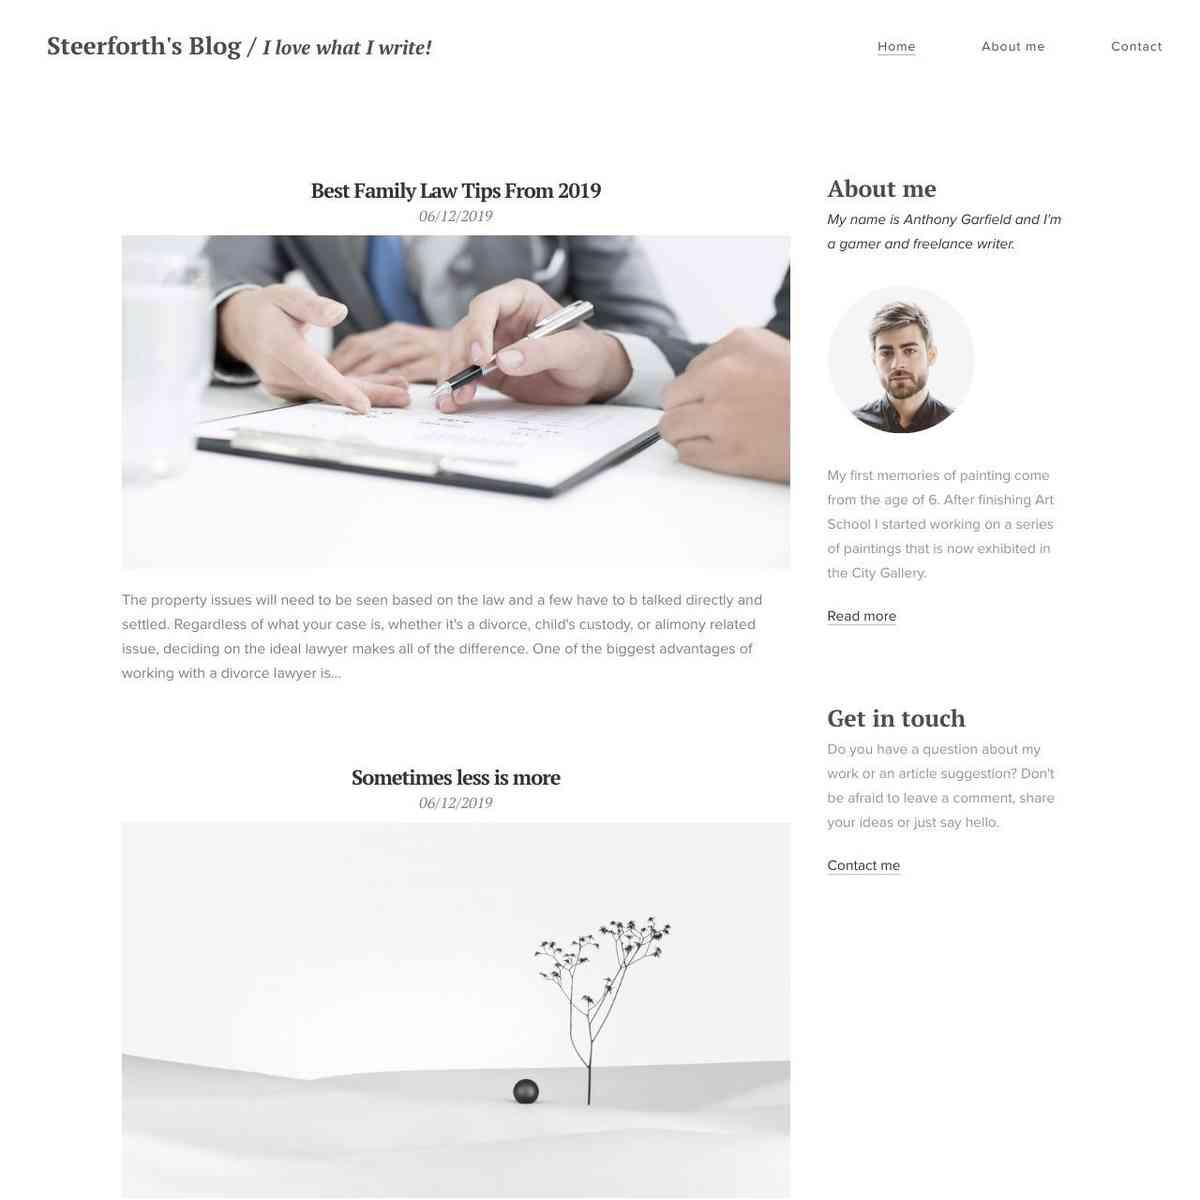 Steerforth Blog